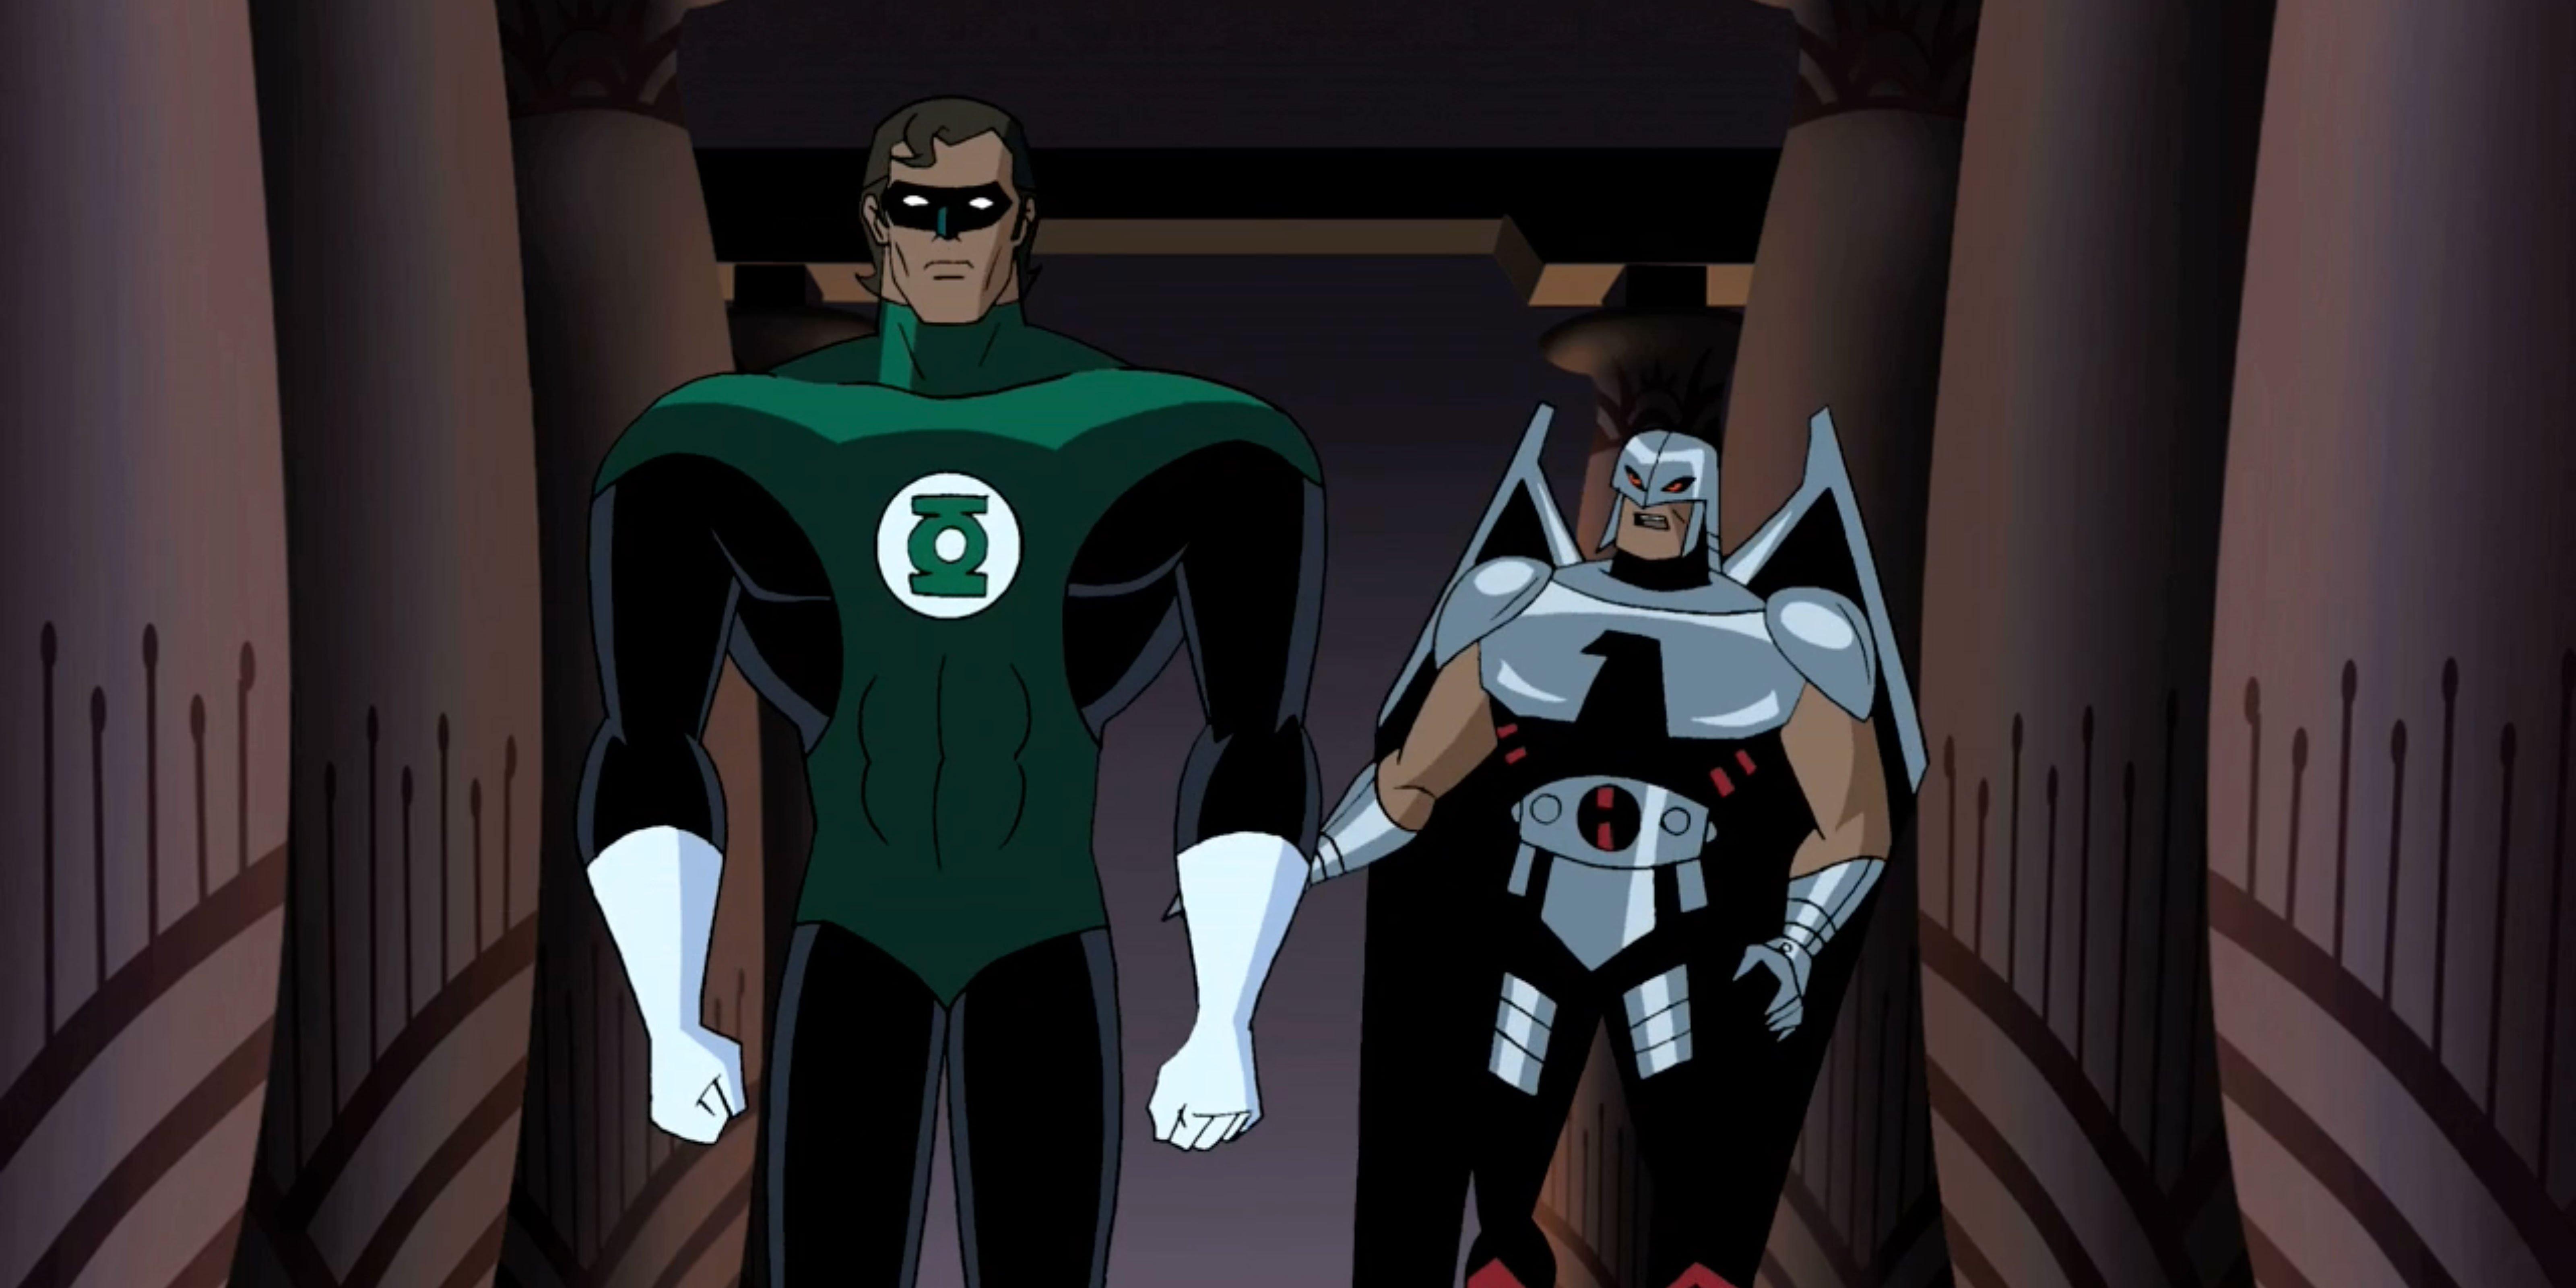 Green Lantern Hal Jordan appears next to a stunned Warhawk.